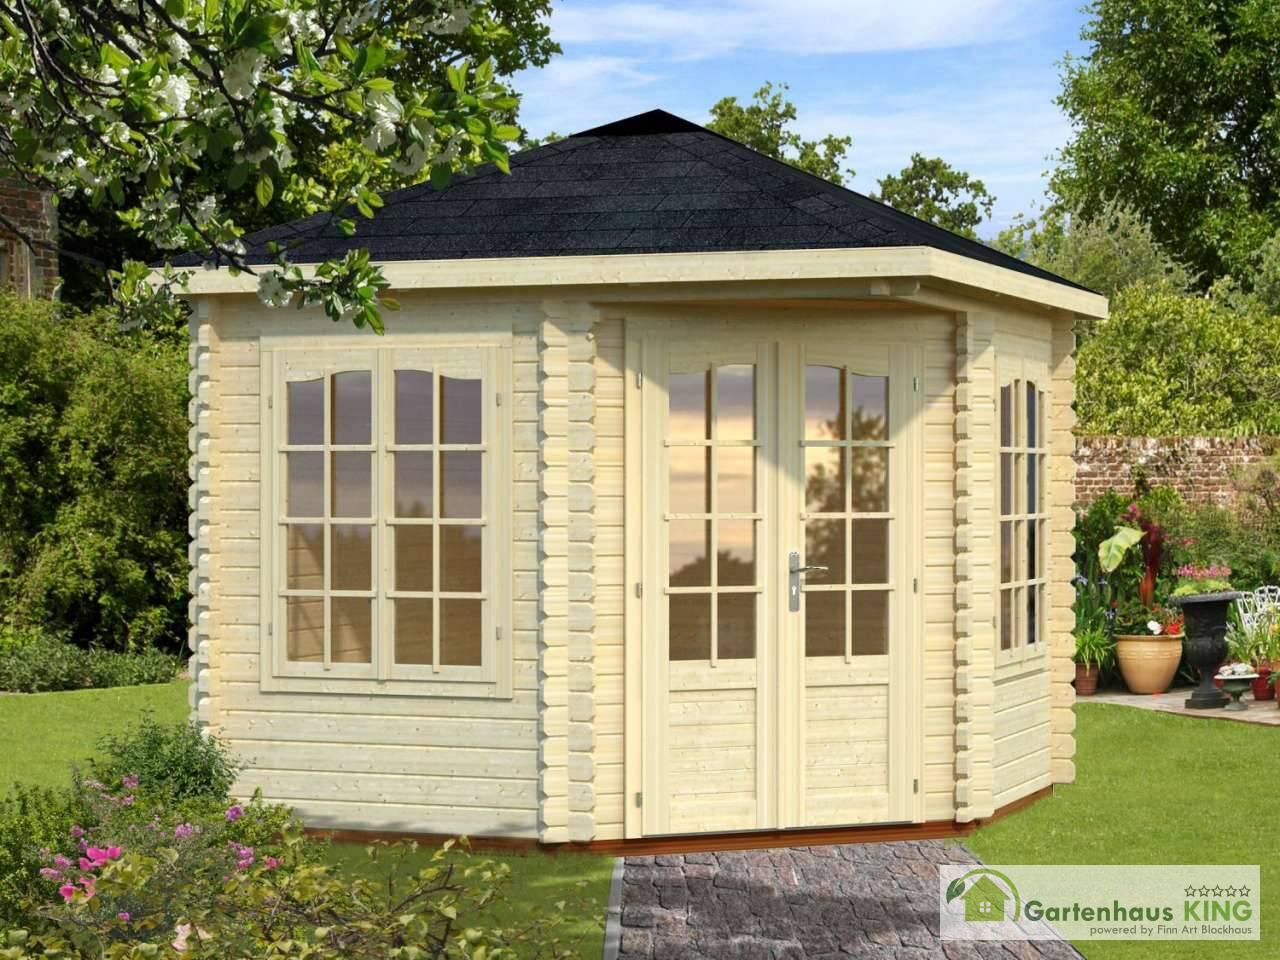 palmako 5 eck gartenhaus melanie 6 6 m gartenhaus. Black Bedroom Furniture Sets. Home Design Ideas